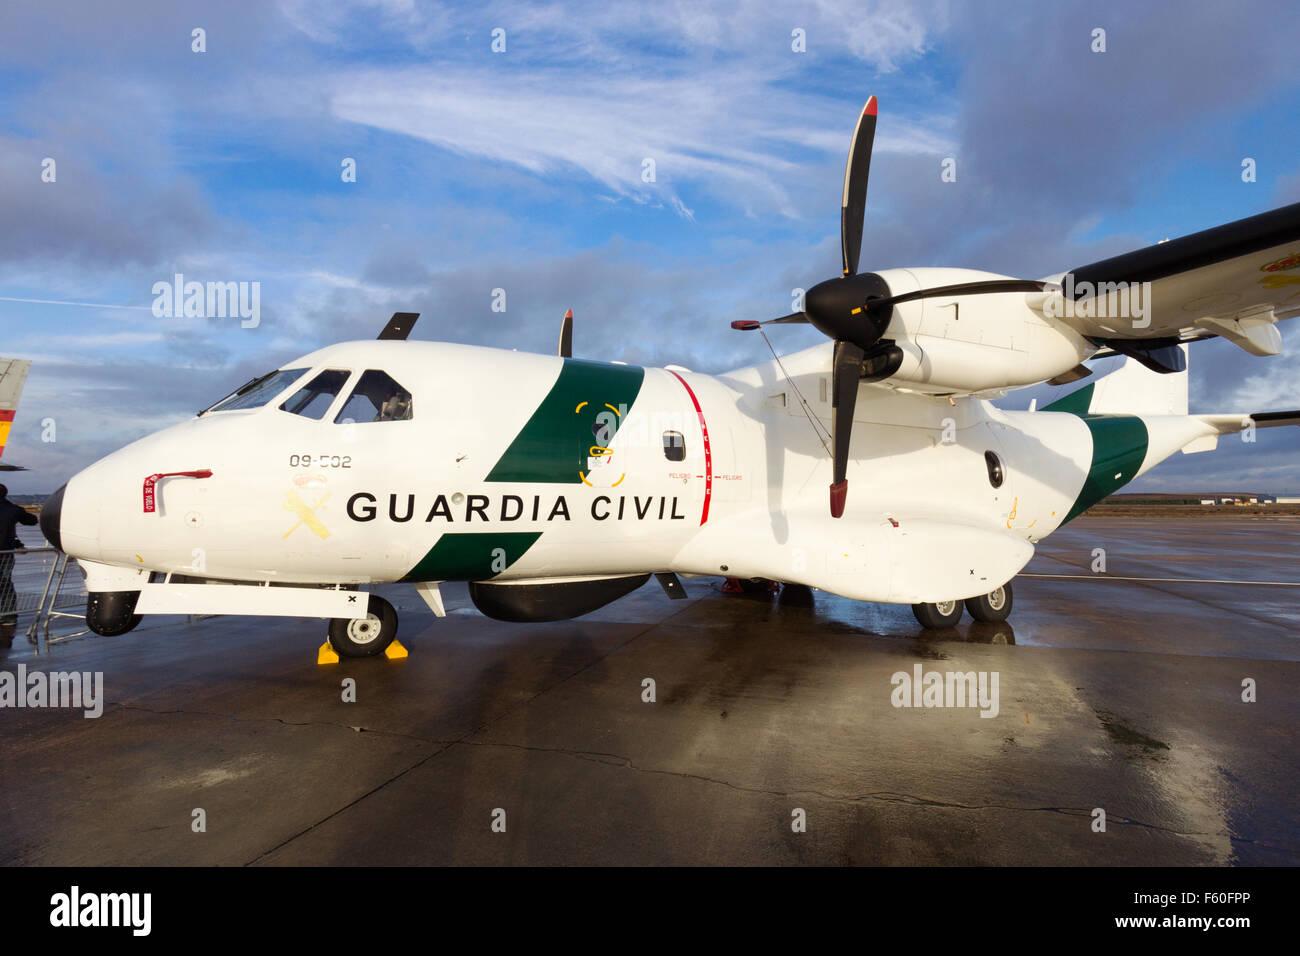 Spanish Guardia Civil Casa CN-235 patrol aircraft. Stock Photo